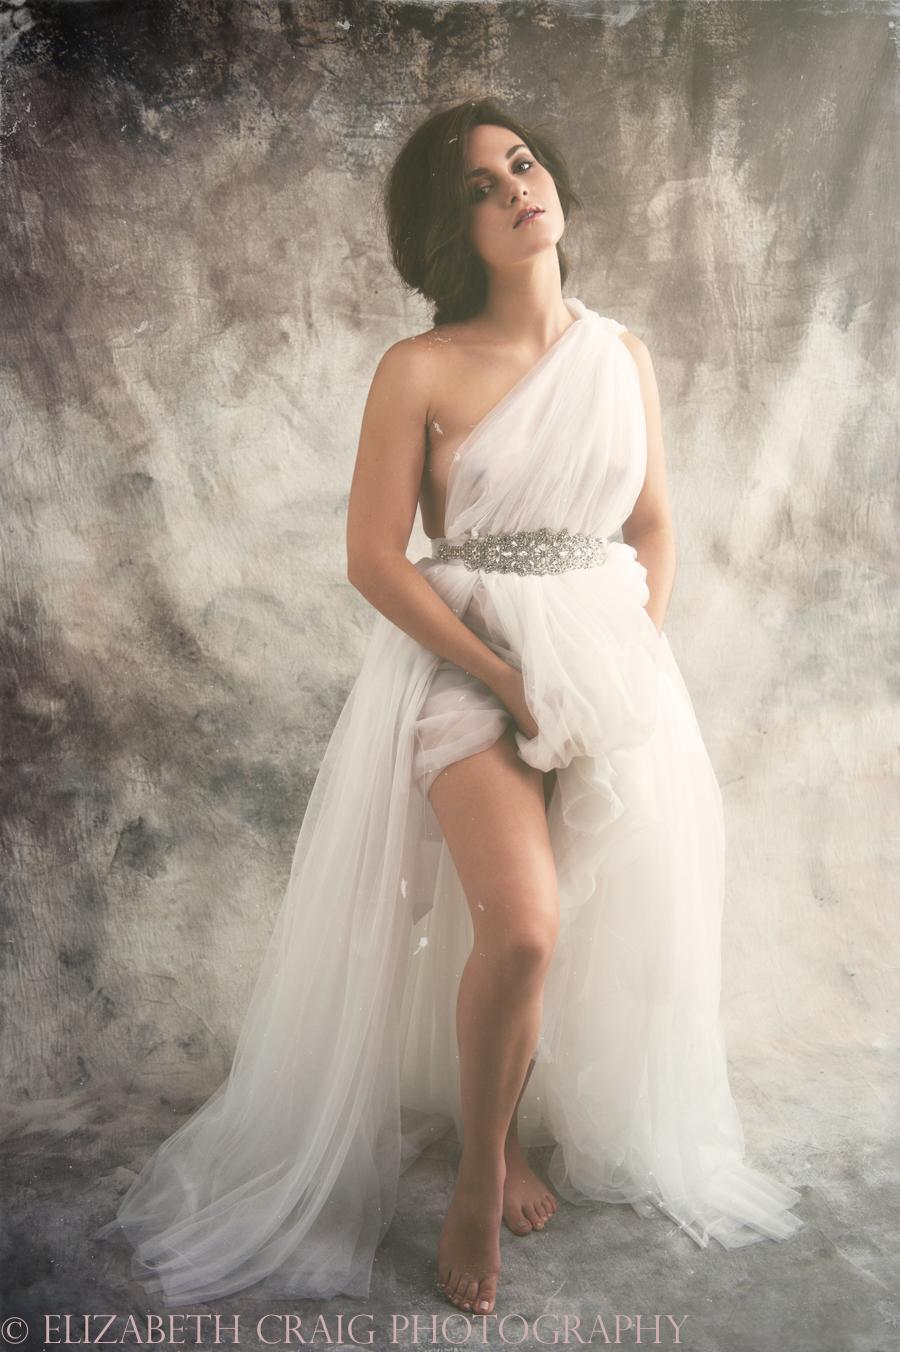 elizabeth-craig-fashion-boudoir-photography-001